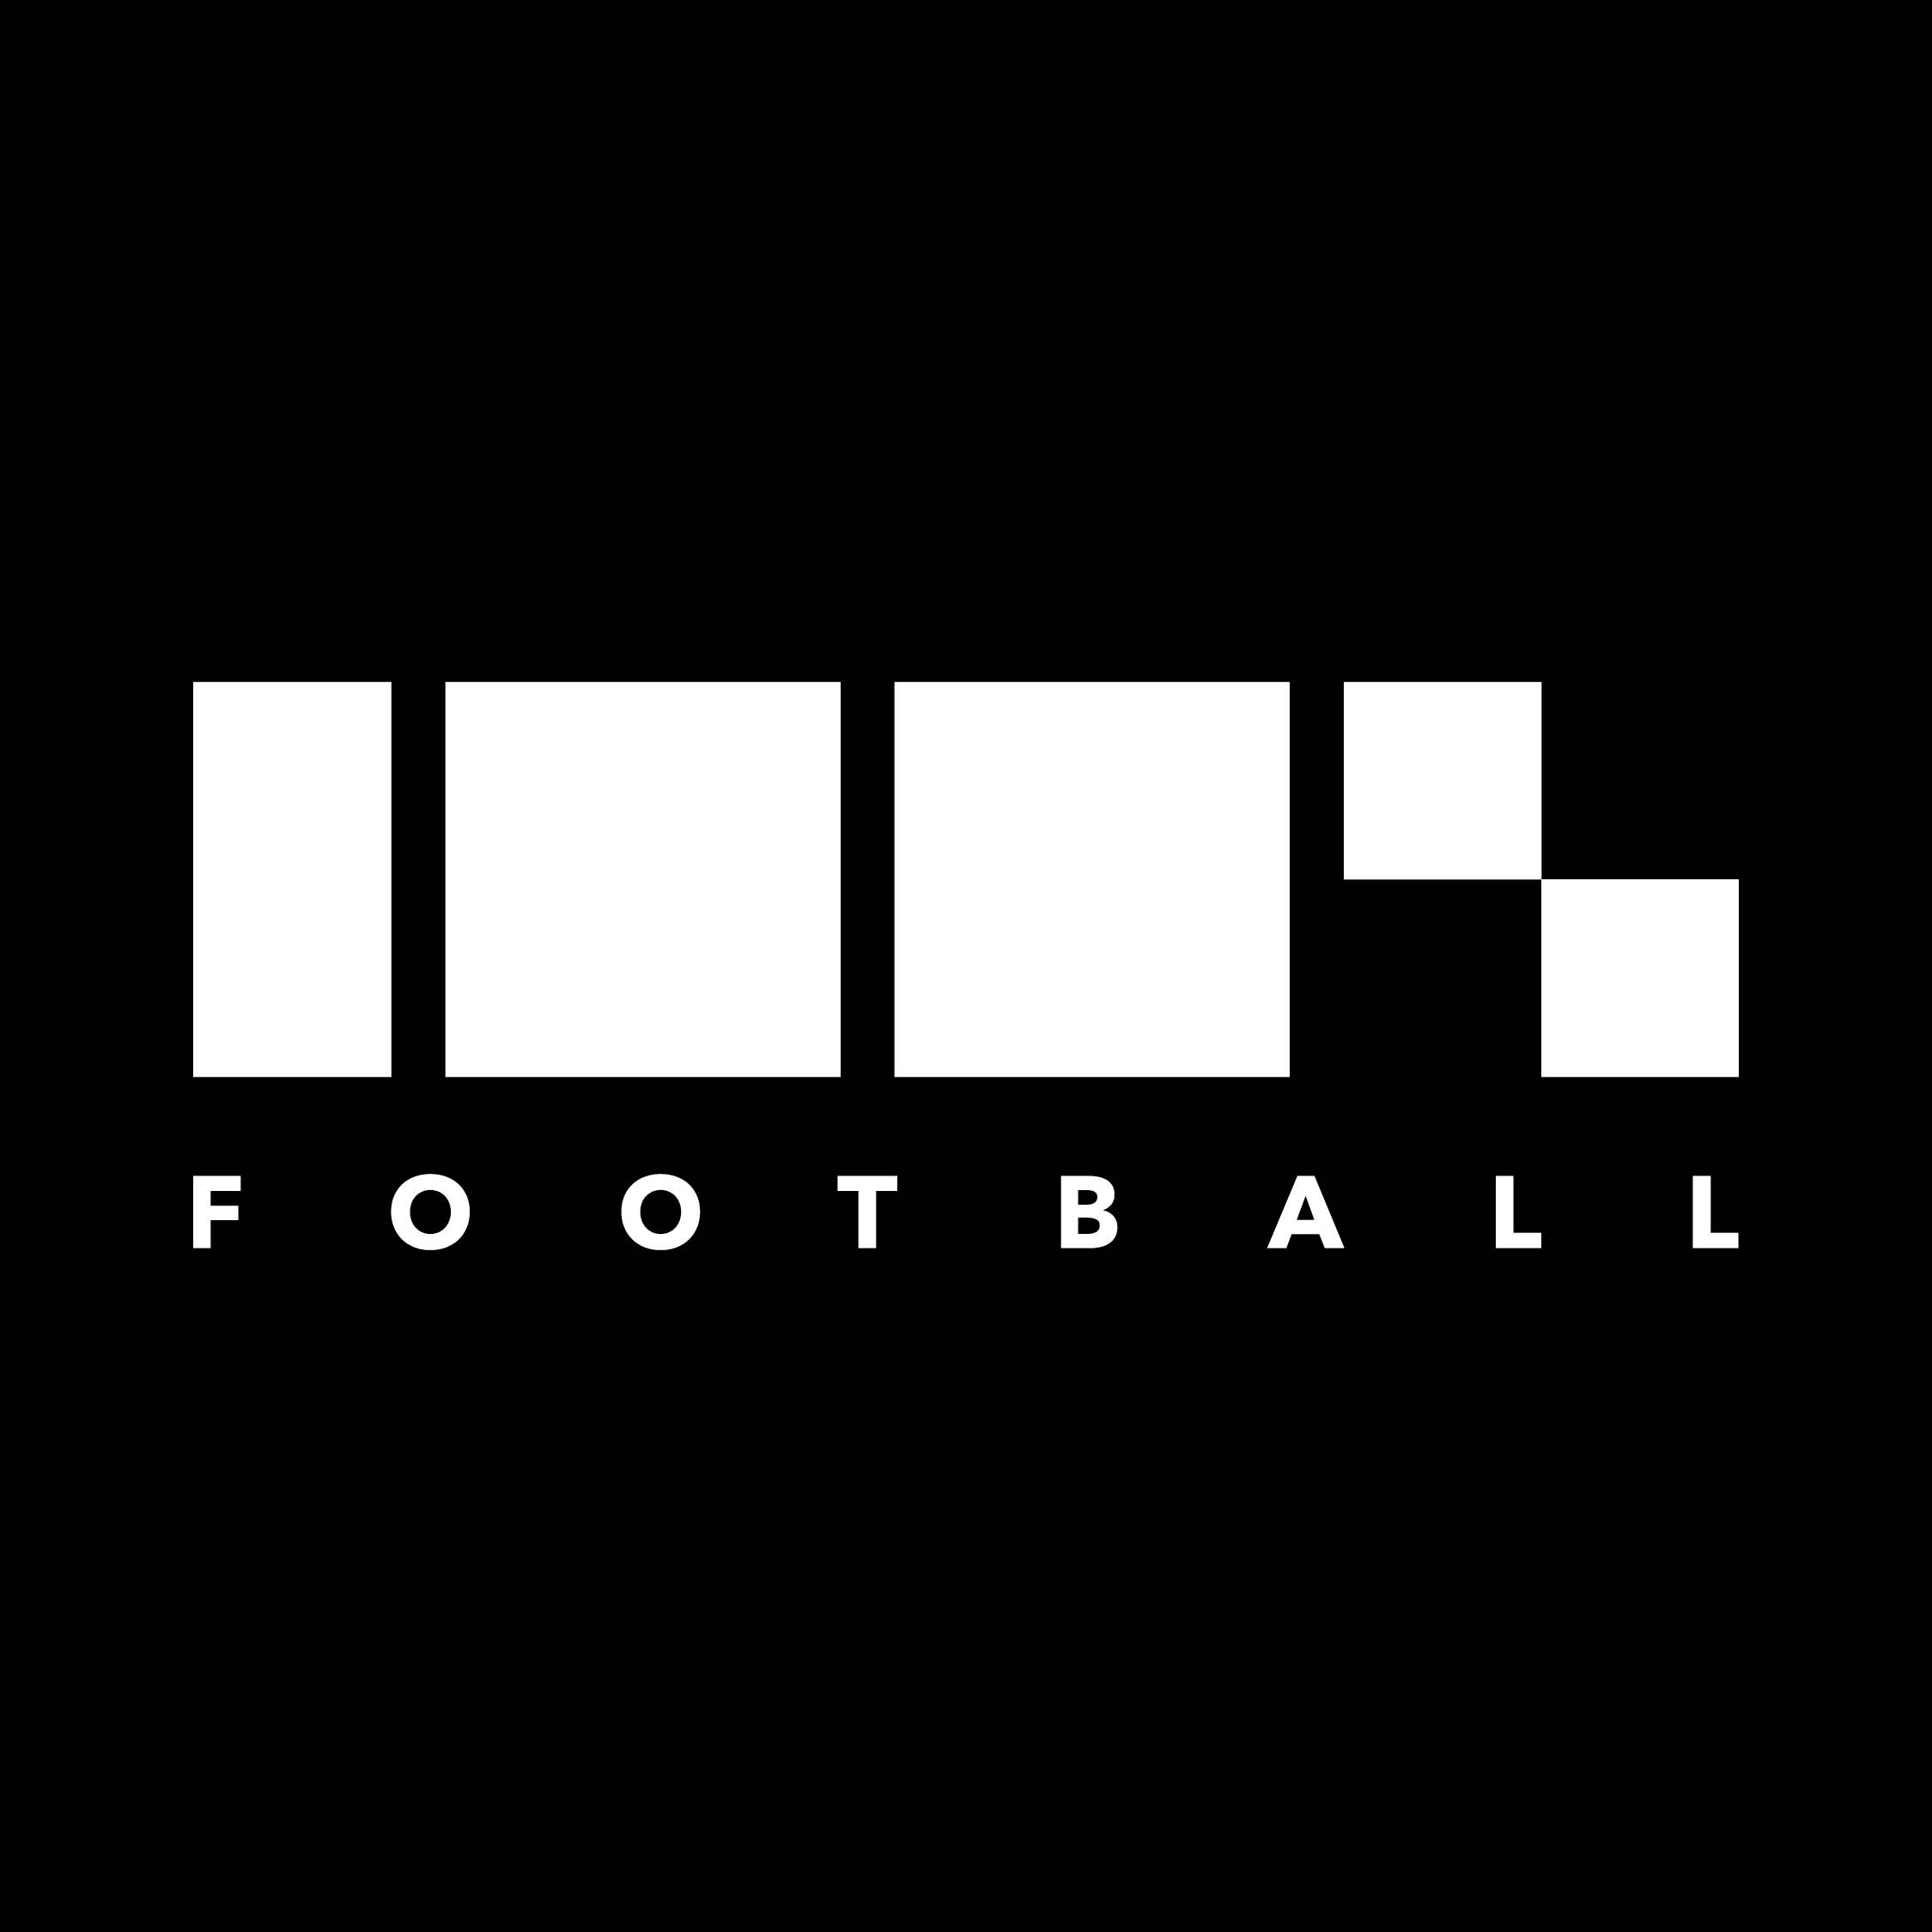 100% Football Gouda